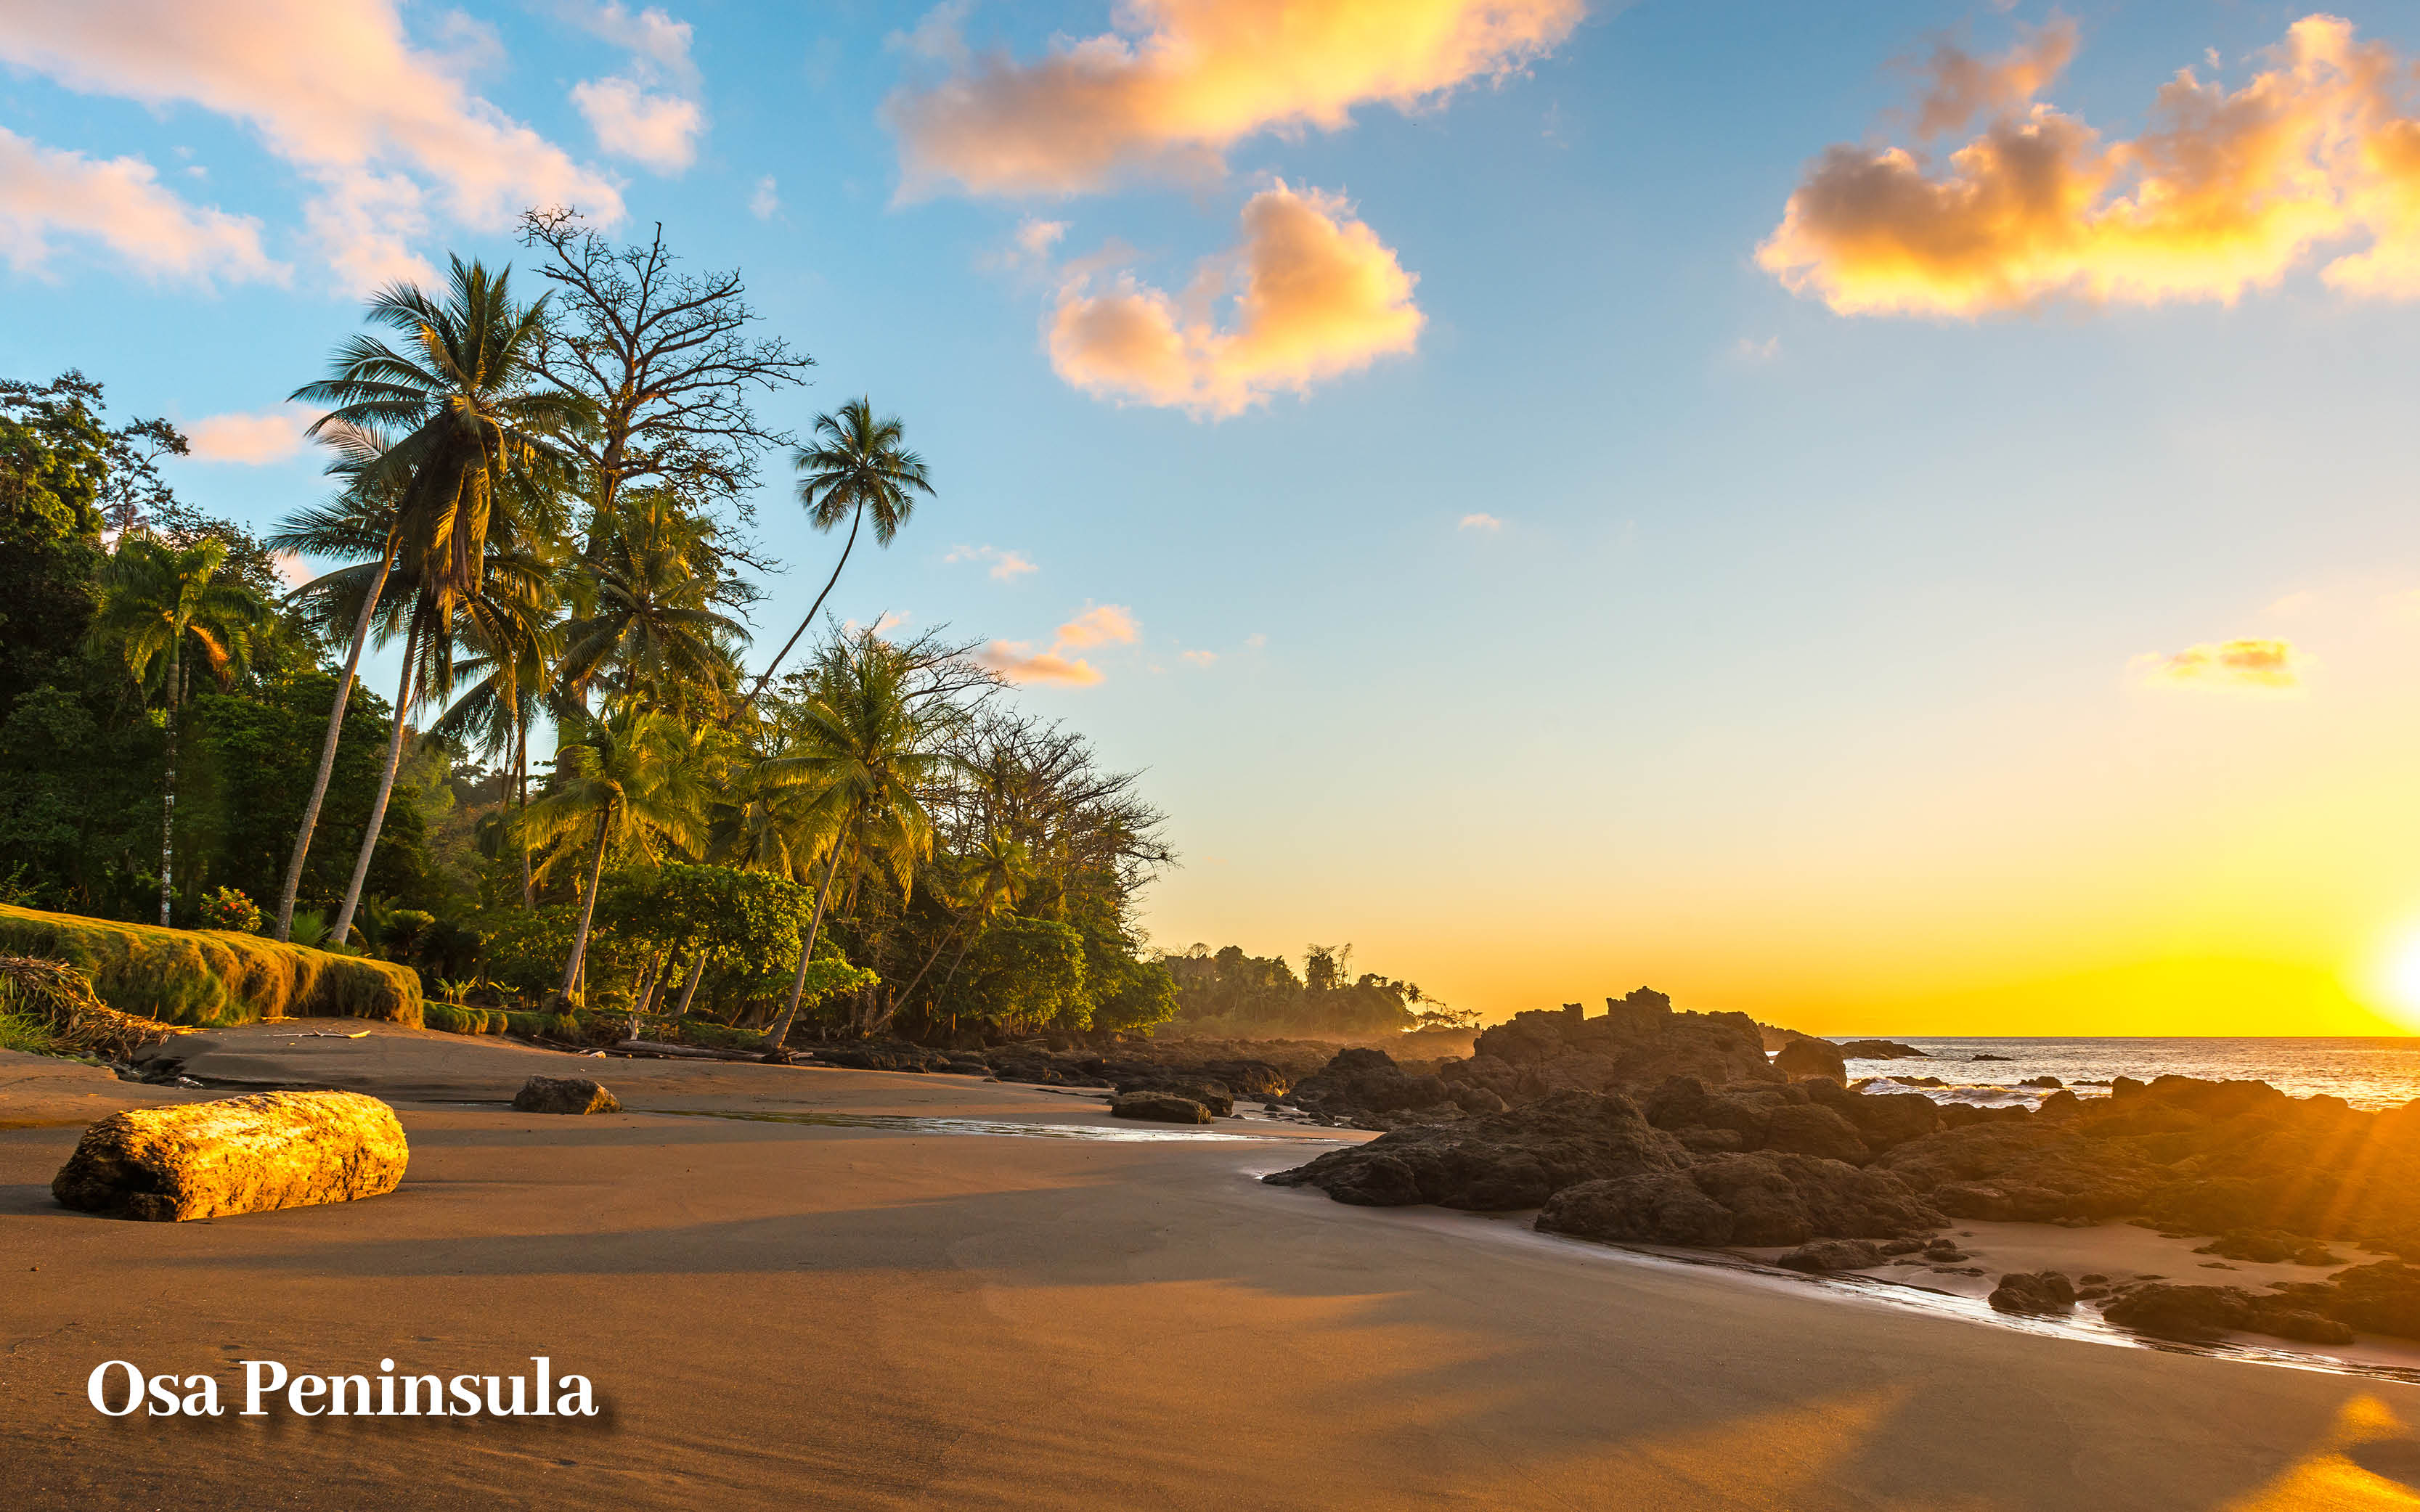 Osa Peninsula Costa Rica Holiday offer